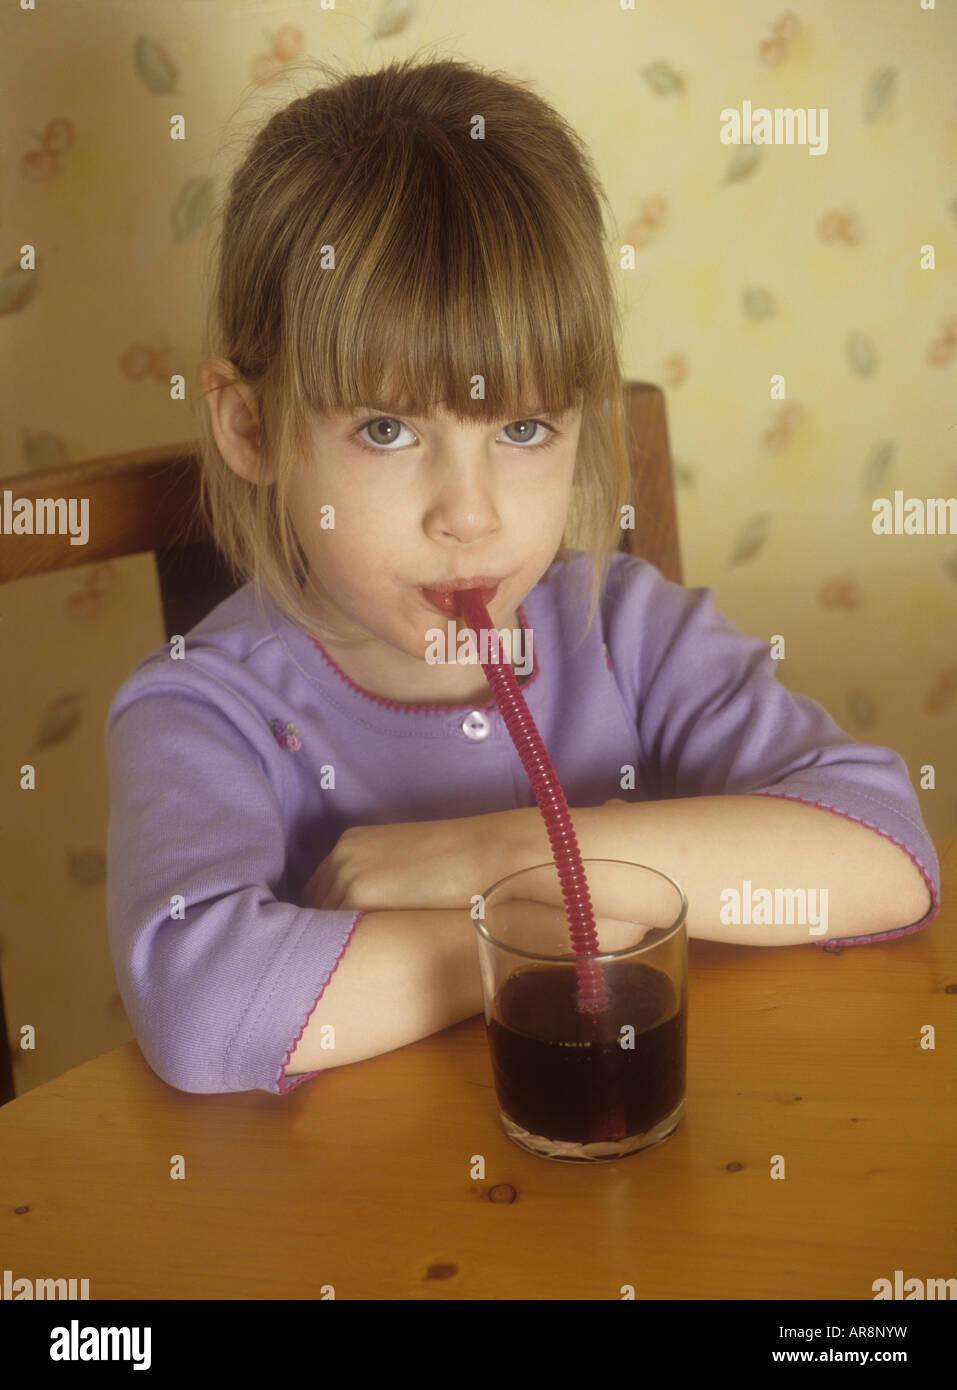 Young girl drinking coke - Stock Image